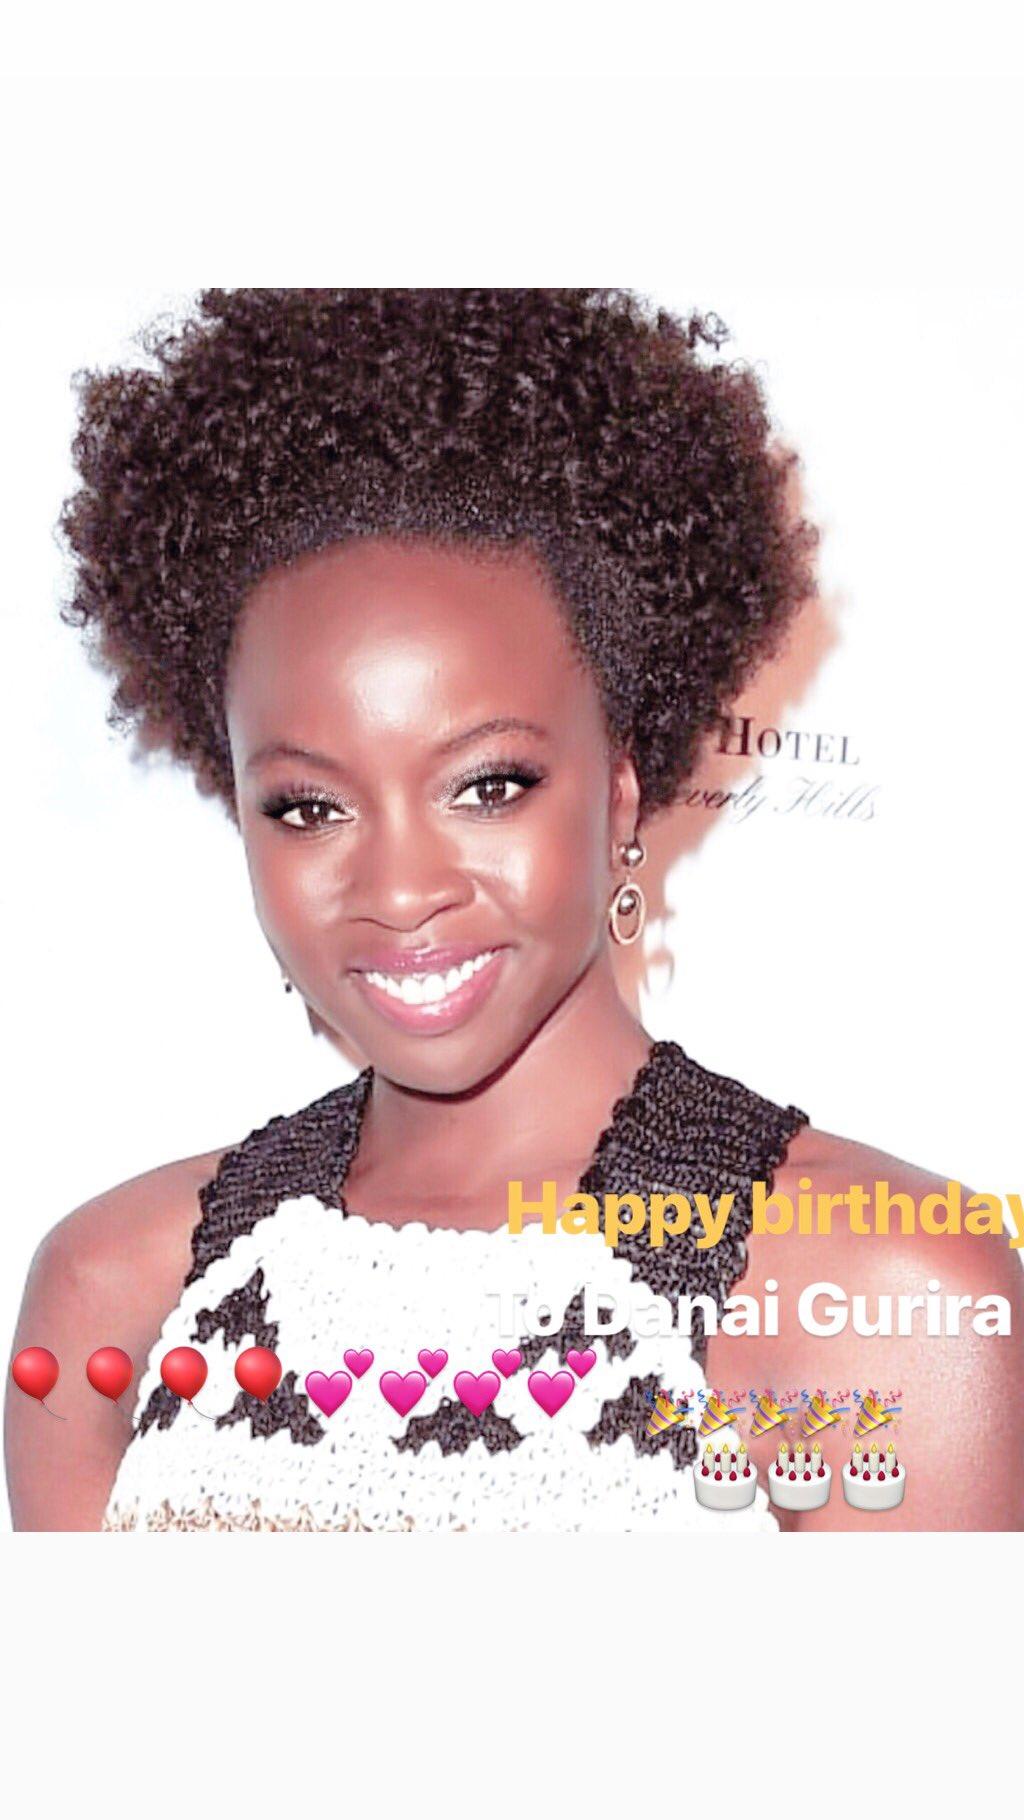 Happy birthday to Danai Gurira    we love you and support you always!!!!